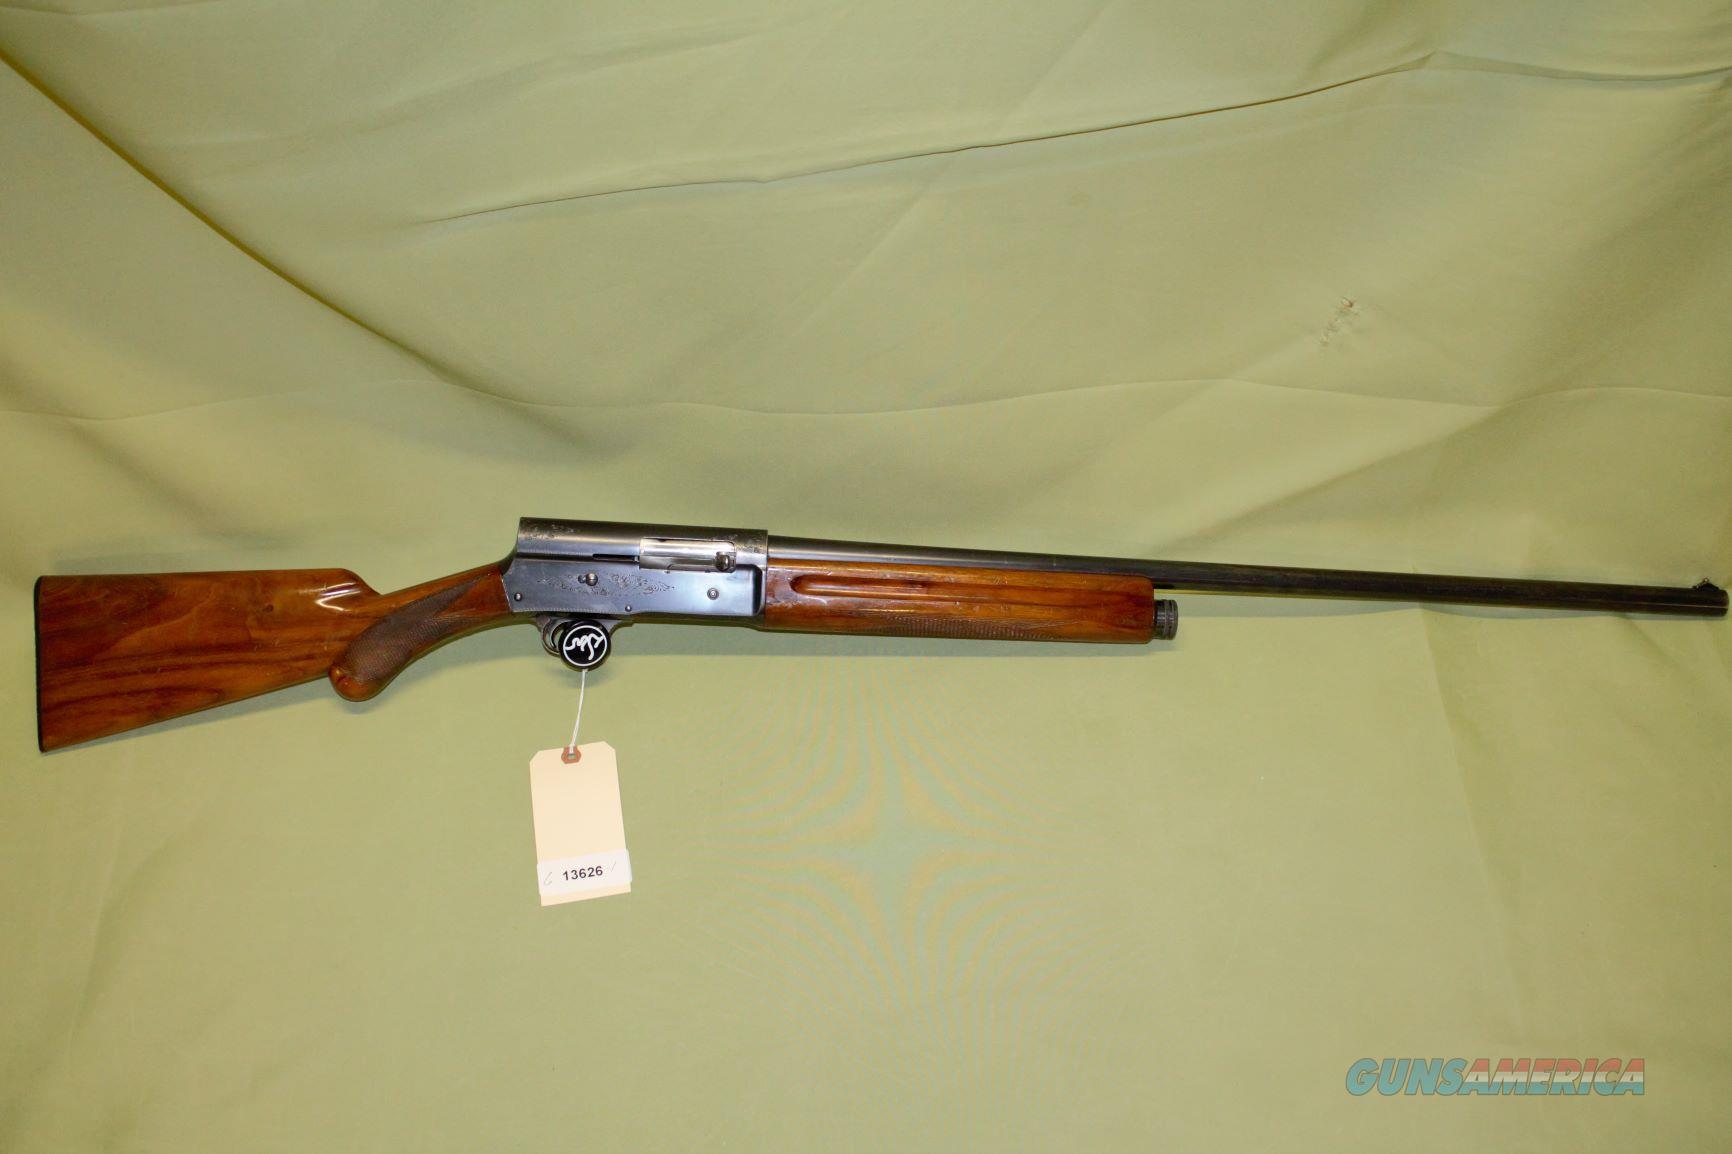 Browning Auto 5 12 Gauge  Guns > Shotguns > Browning Shotguns > Autoloaders > Hunting